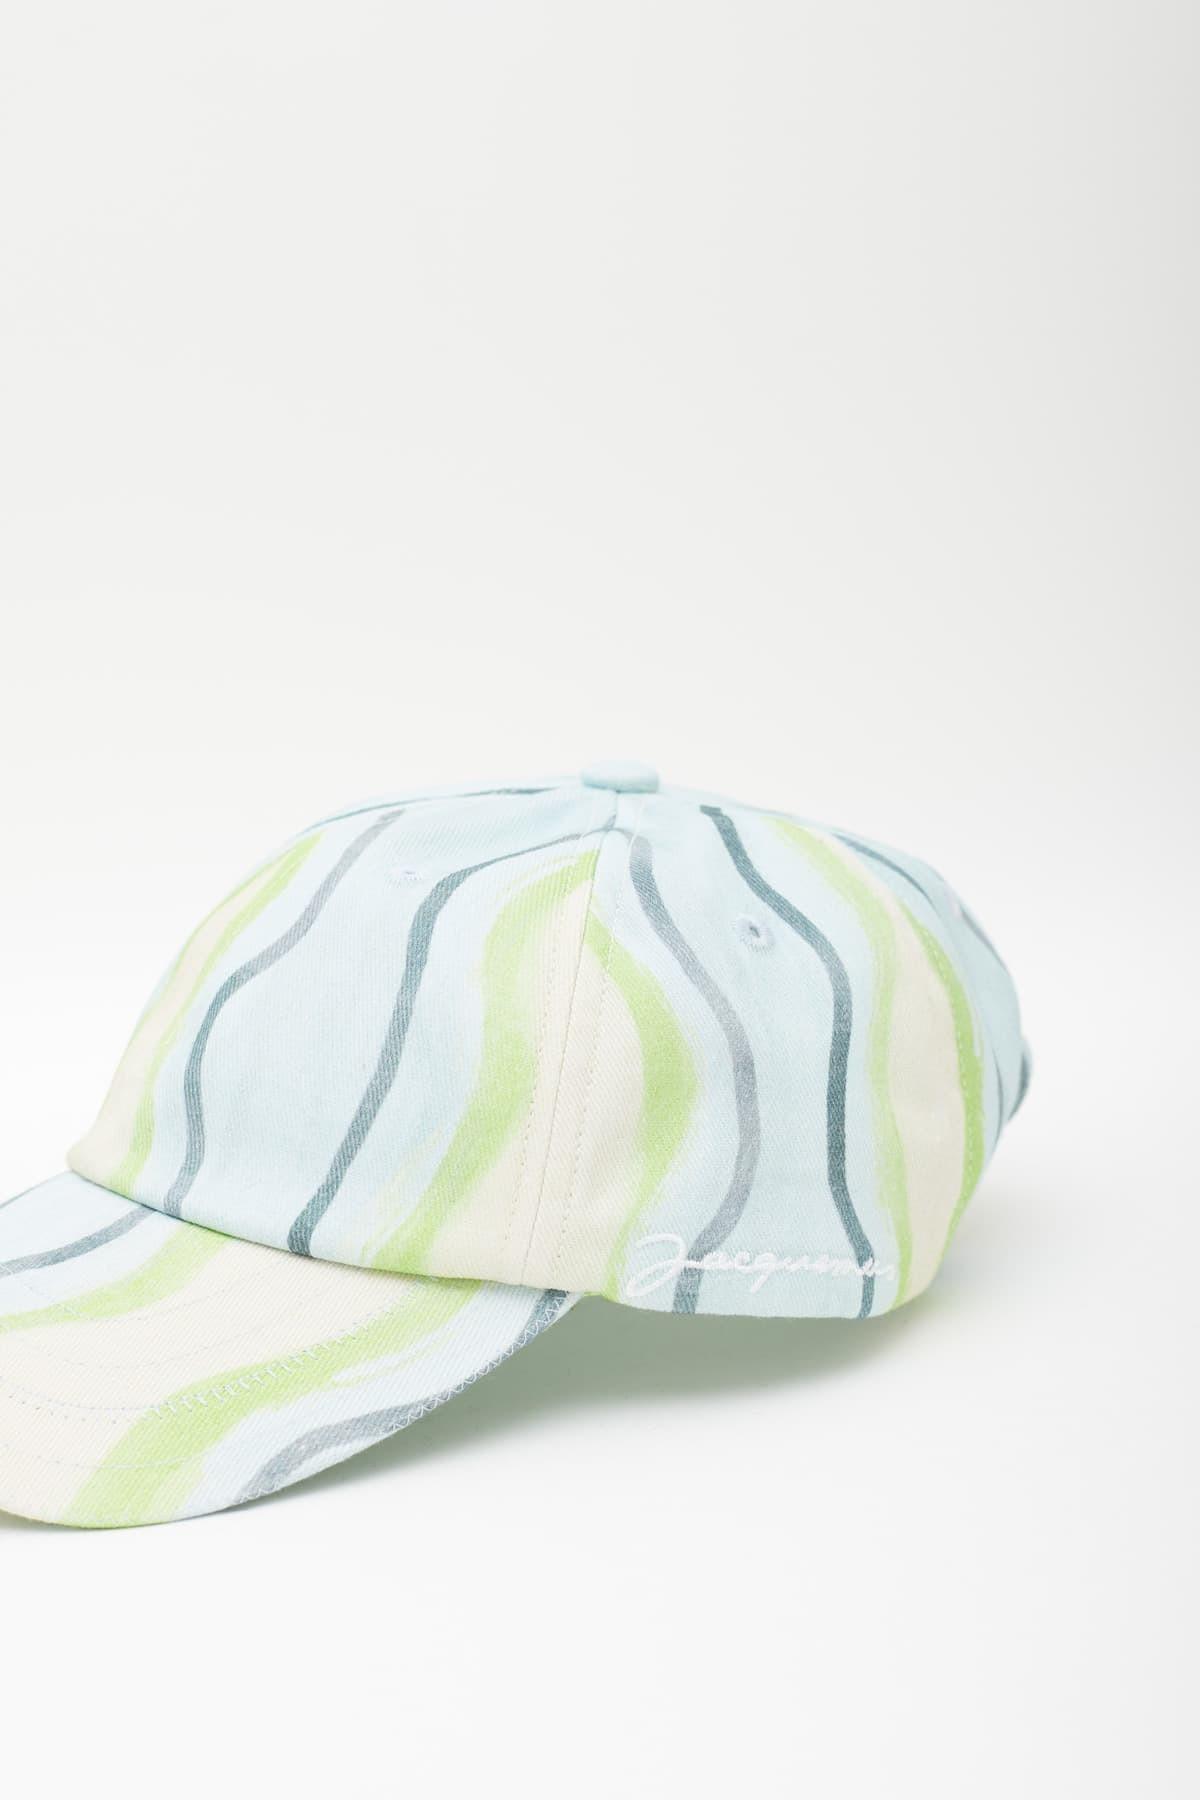 Comprar RASSVET Black Hurt Denim Trouser PACC9P001